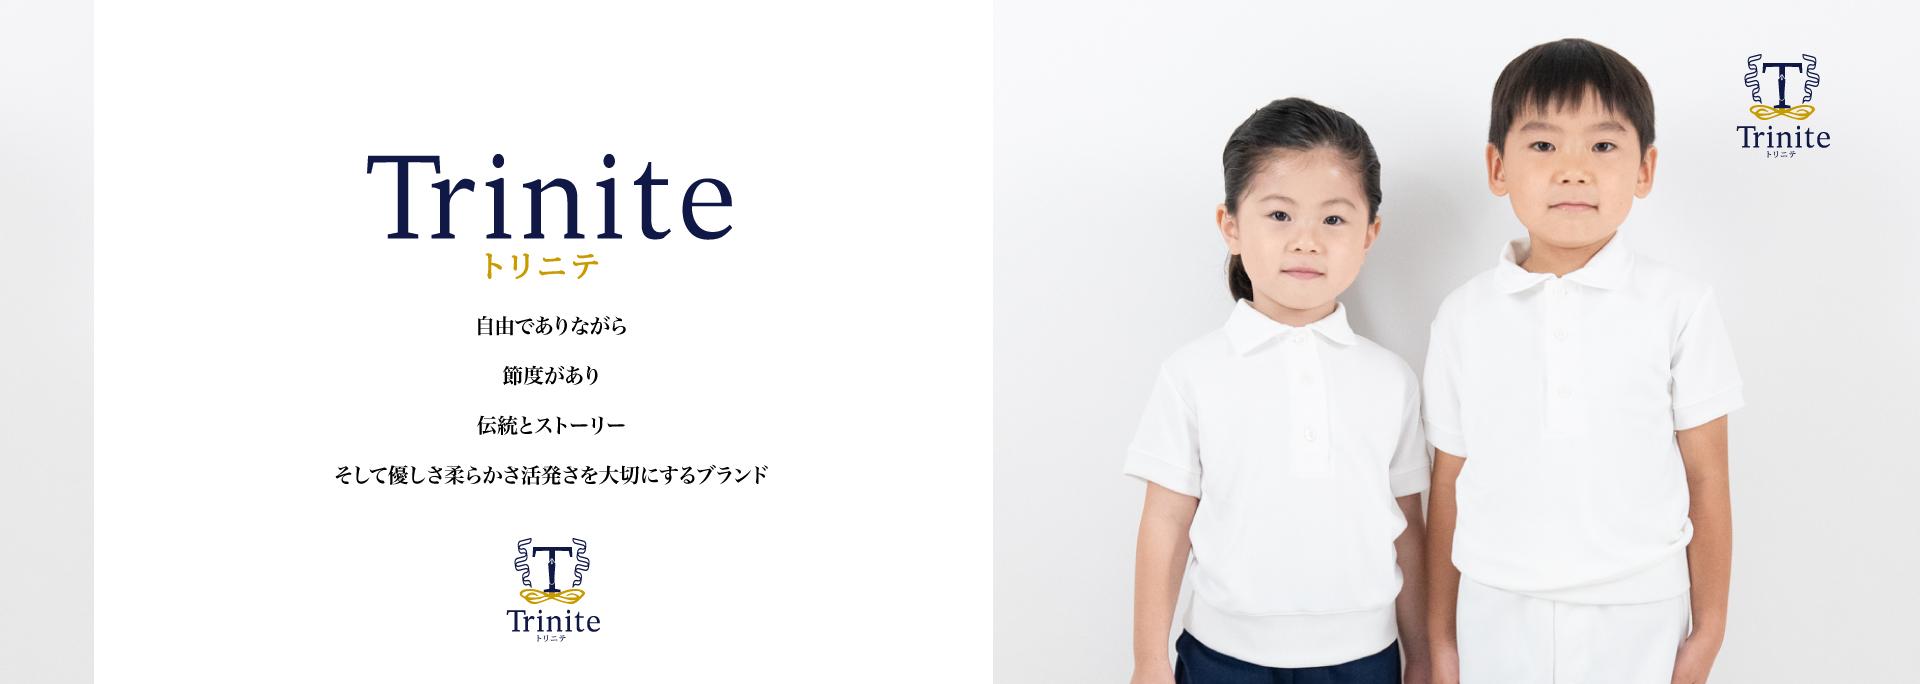 Trinite トリニテ 私立小ママの想いを形にしたお受験・通園通学用品オーダーショップ